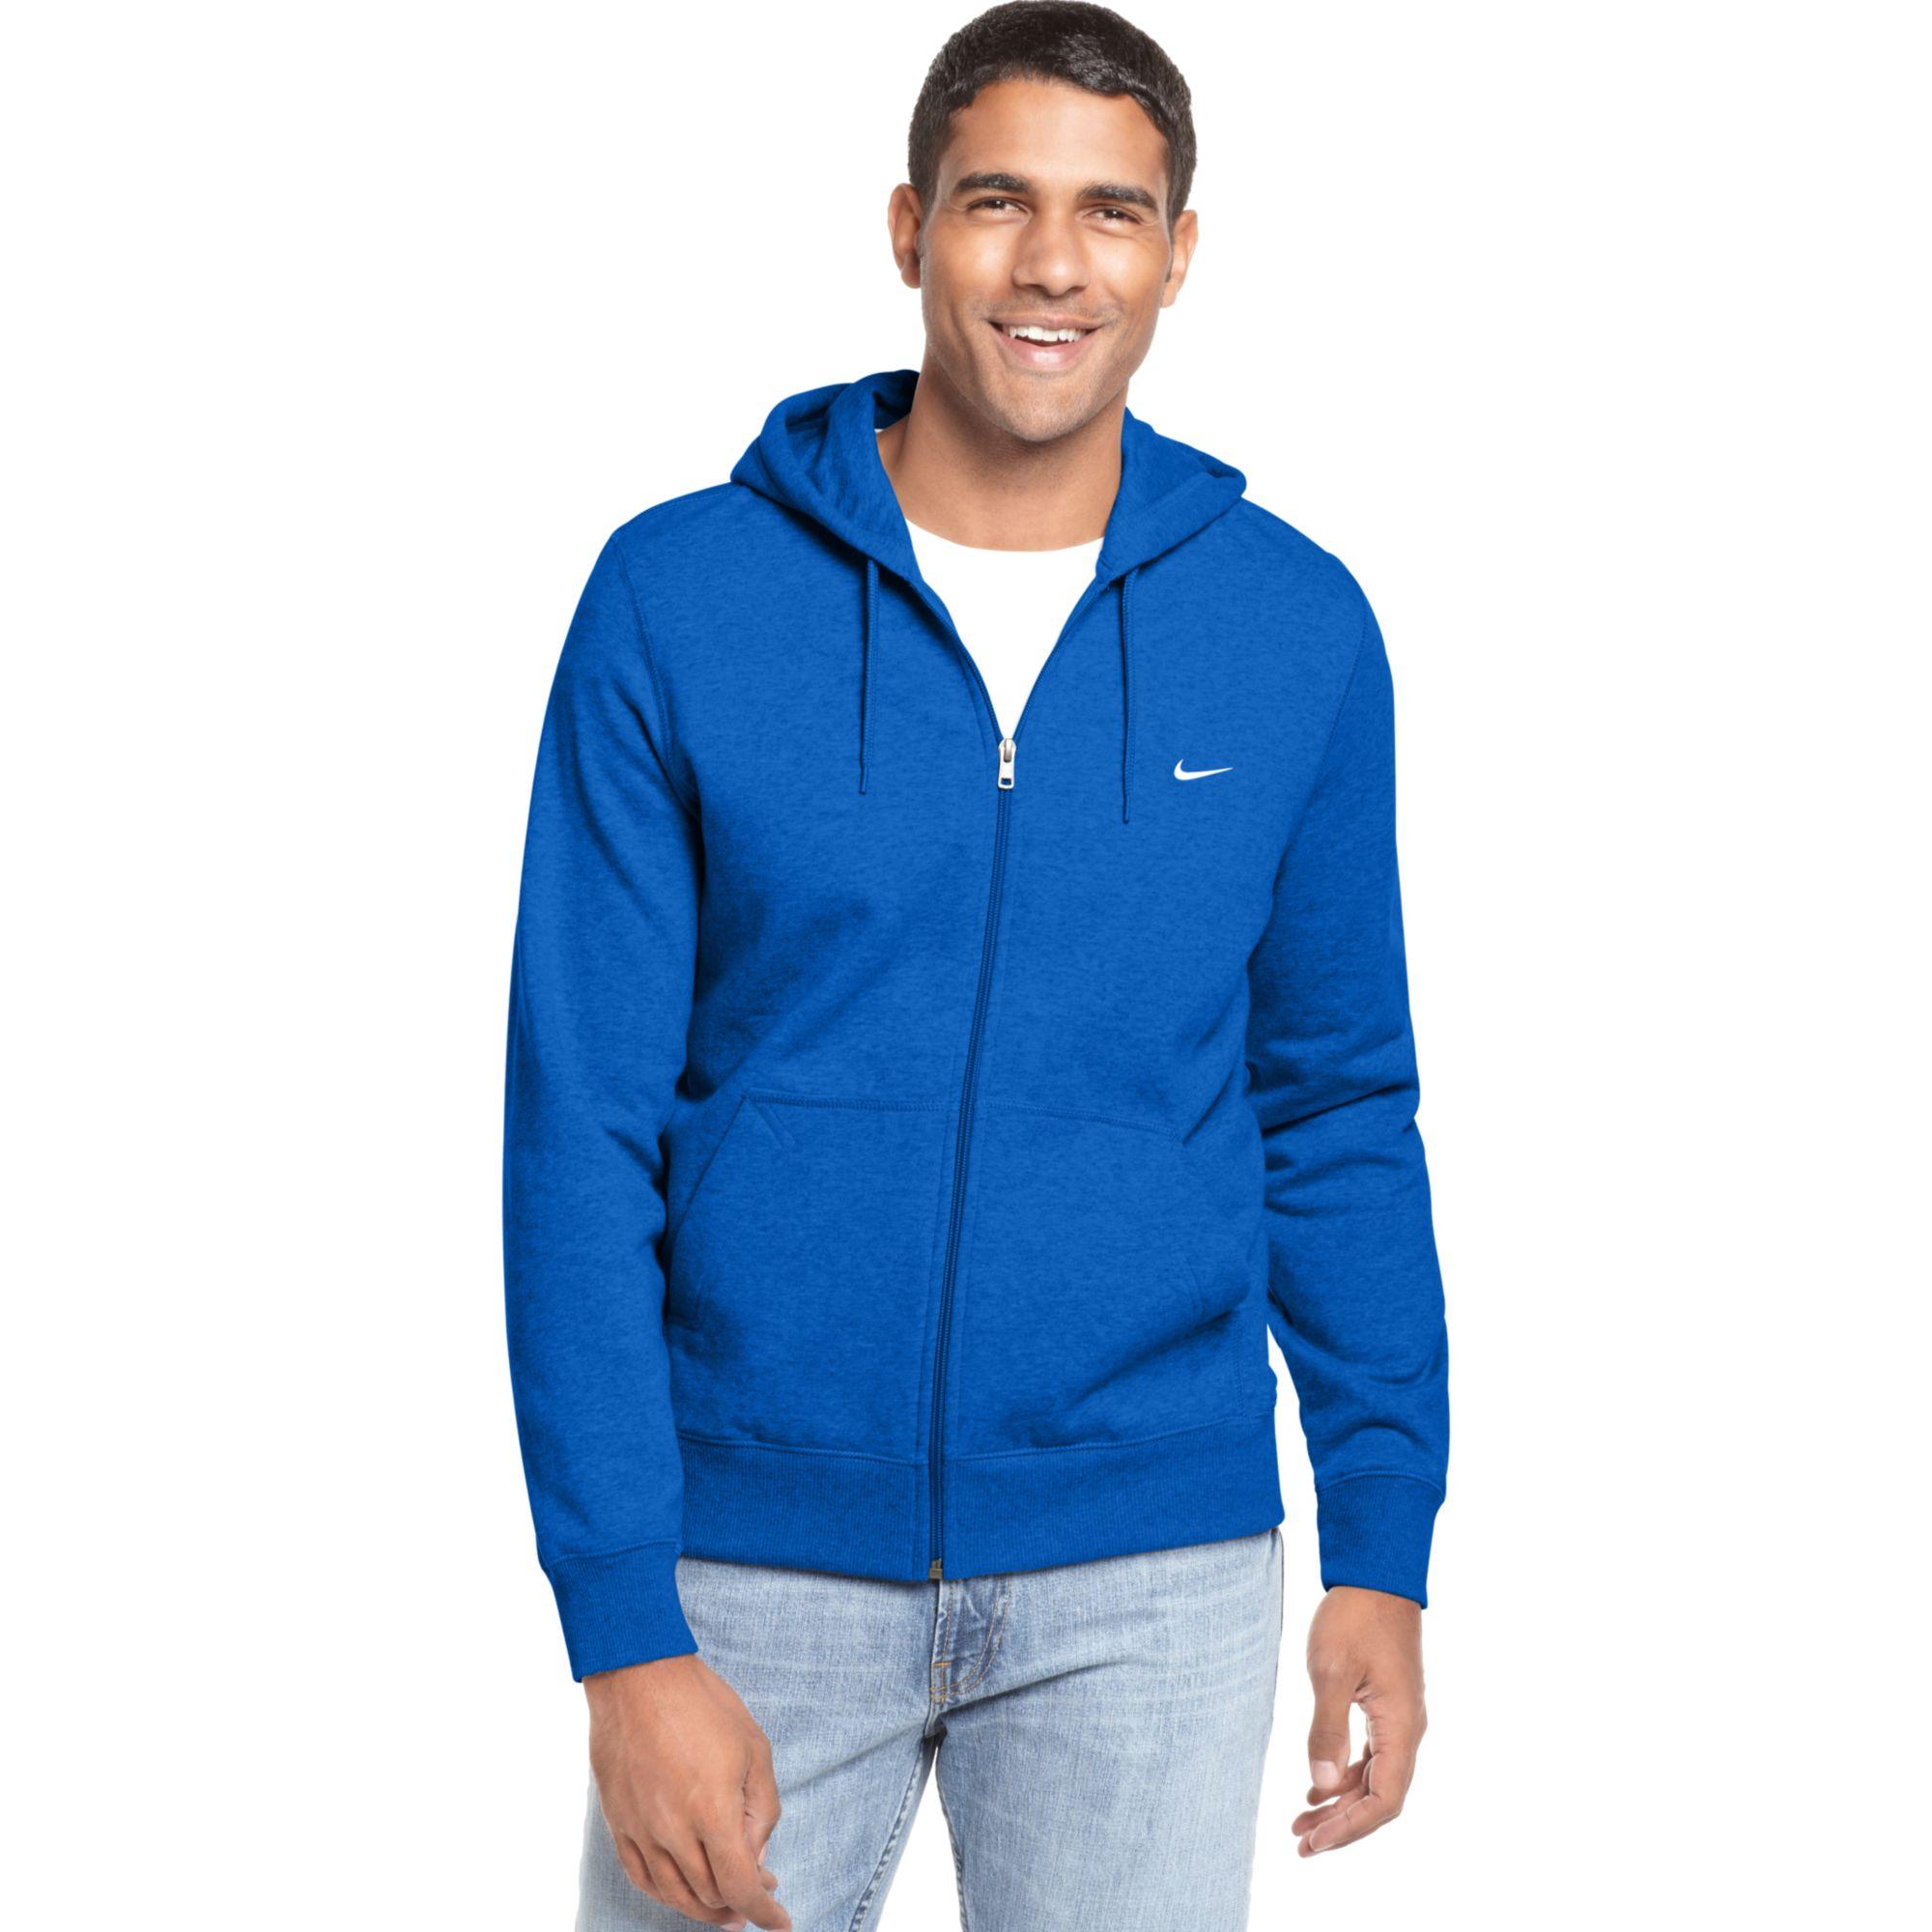 4477f8625d42 Lyst - Nike Classic Fleece Full Zip Hoodie in Blue for Men